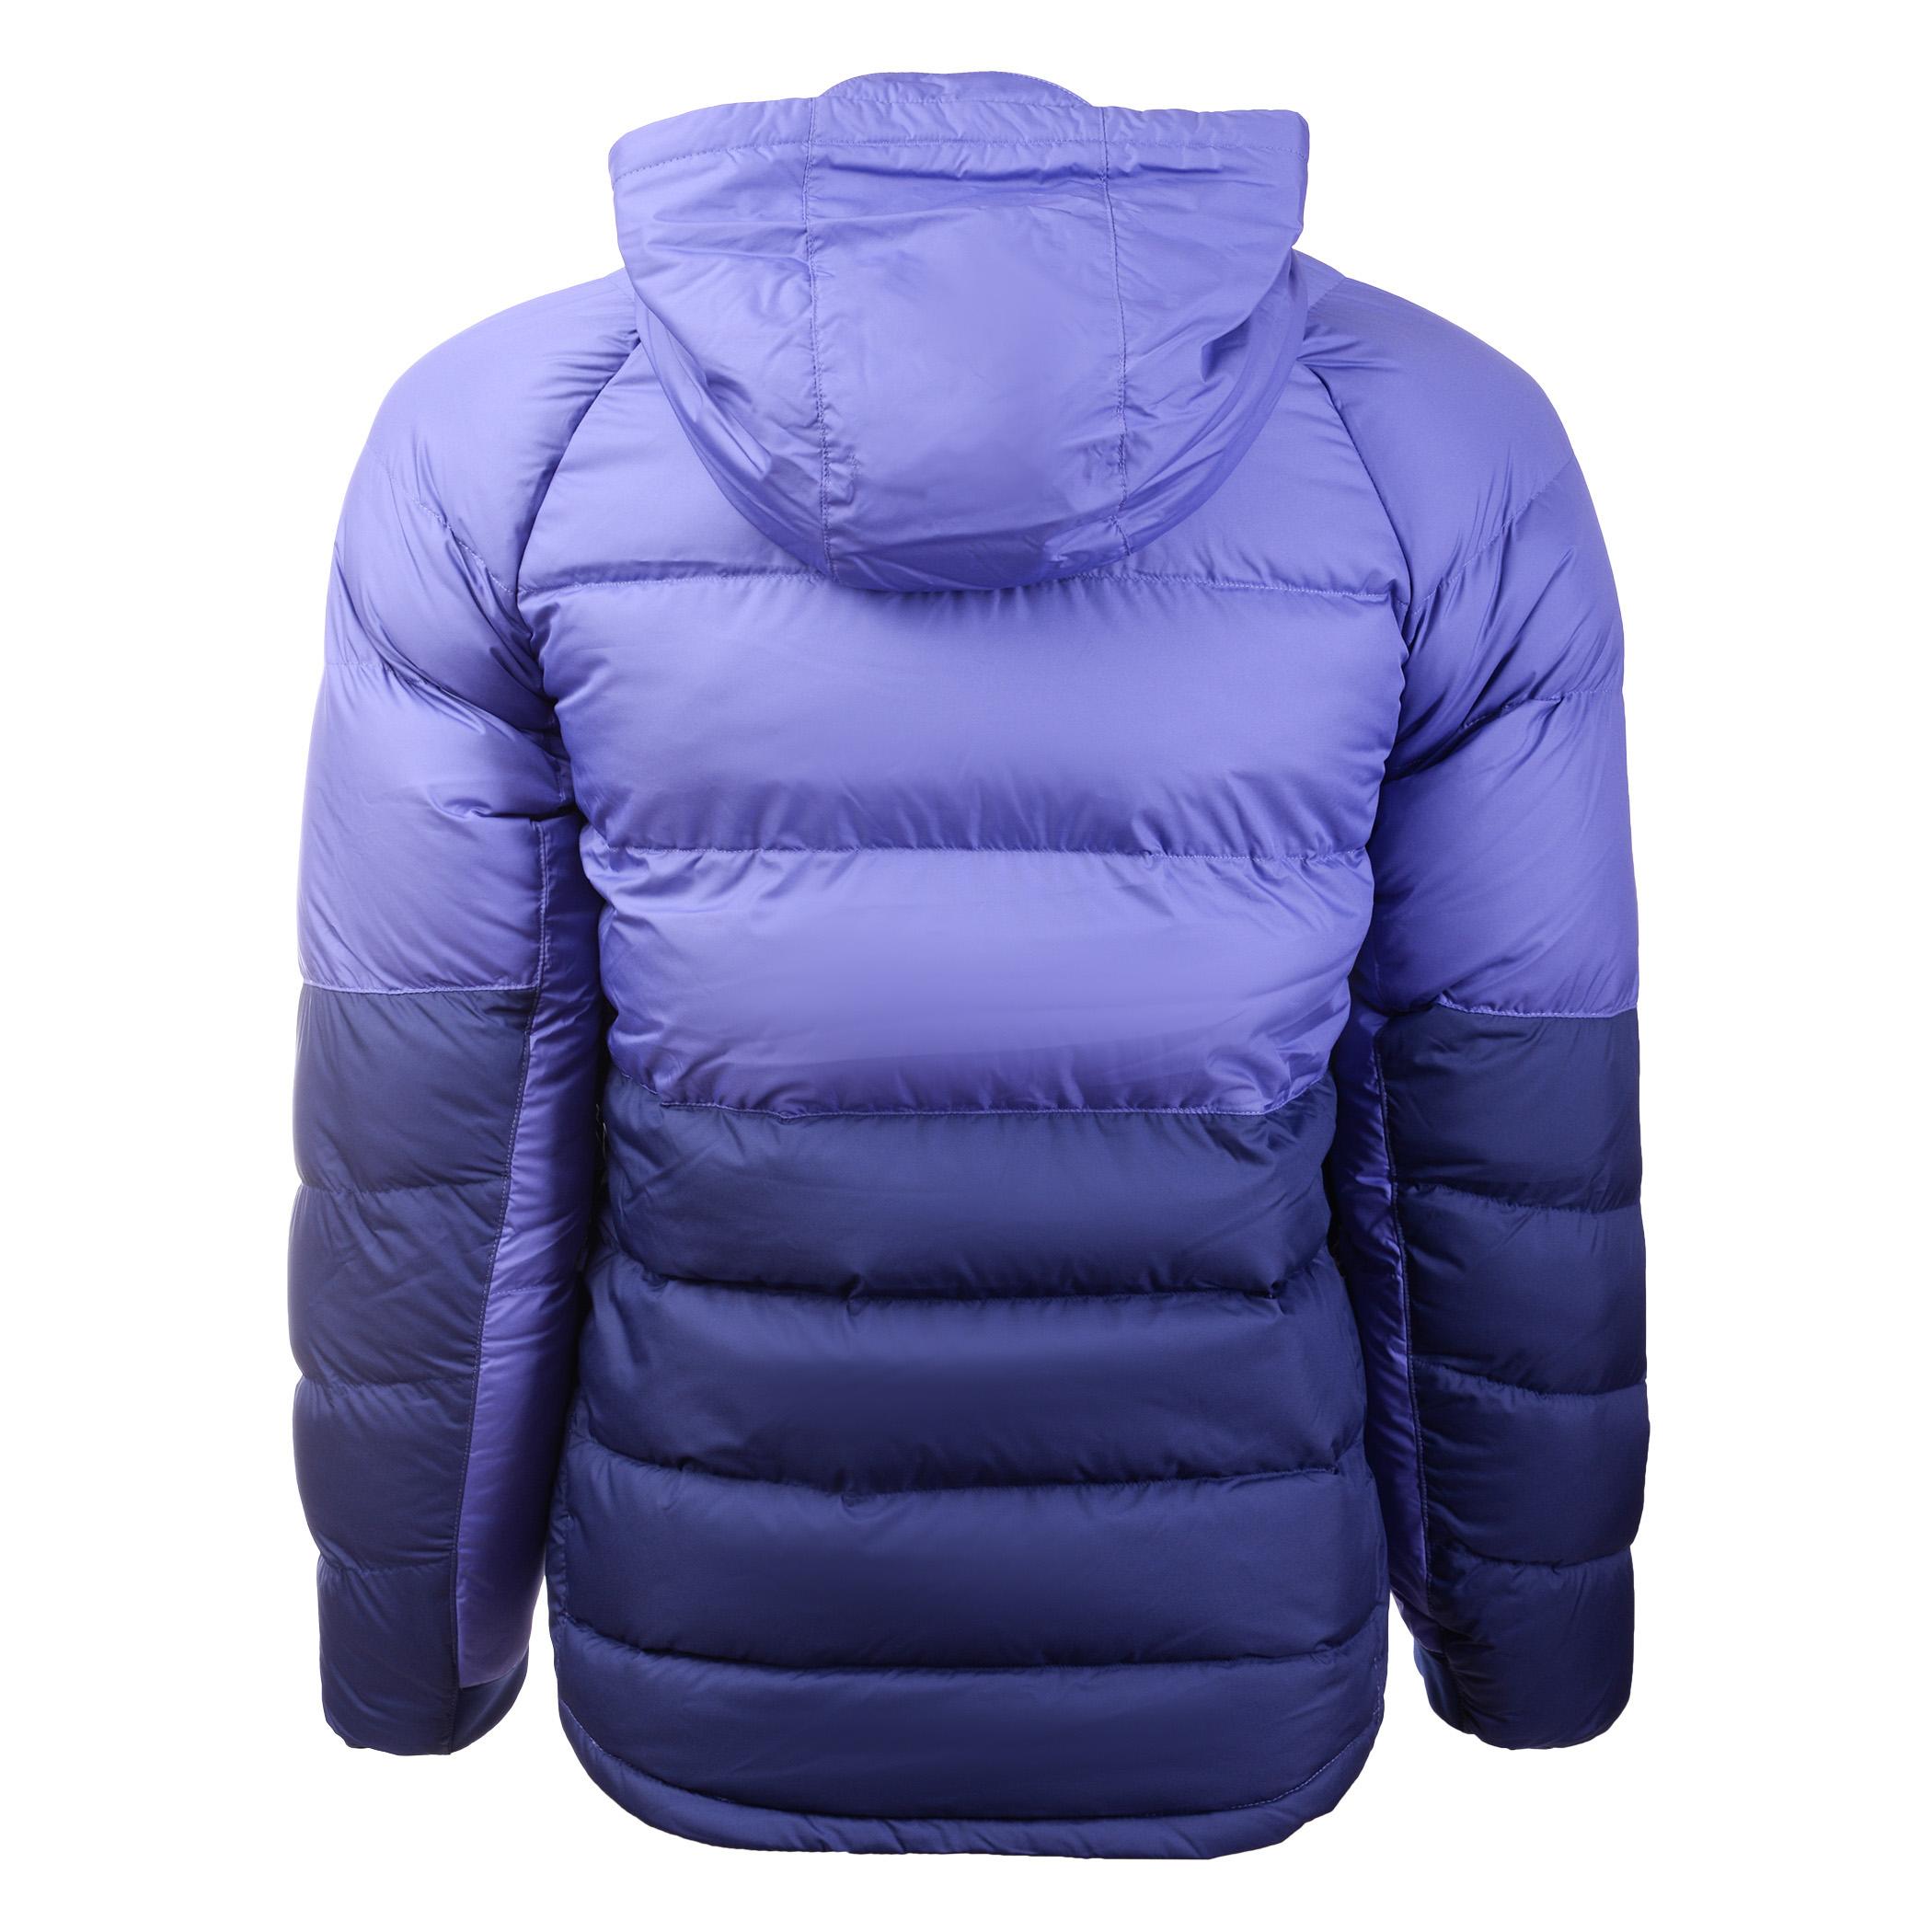 bbccfcdb Детская куртка Nike Parka Down Ow Rush Violet/Blue Void/Lava Glow - фото